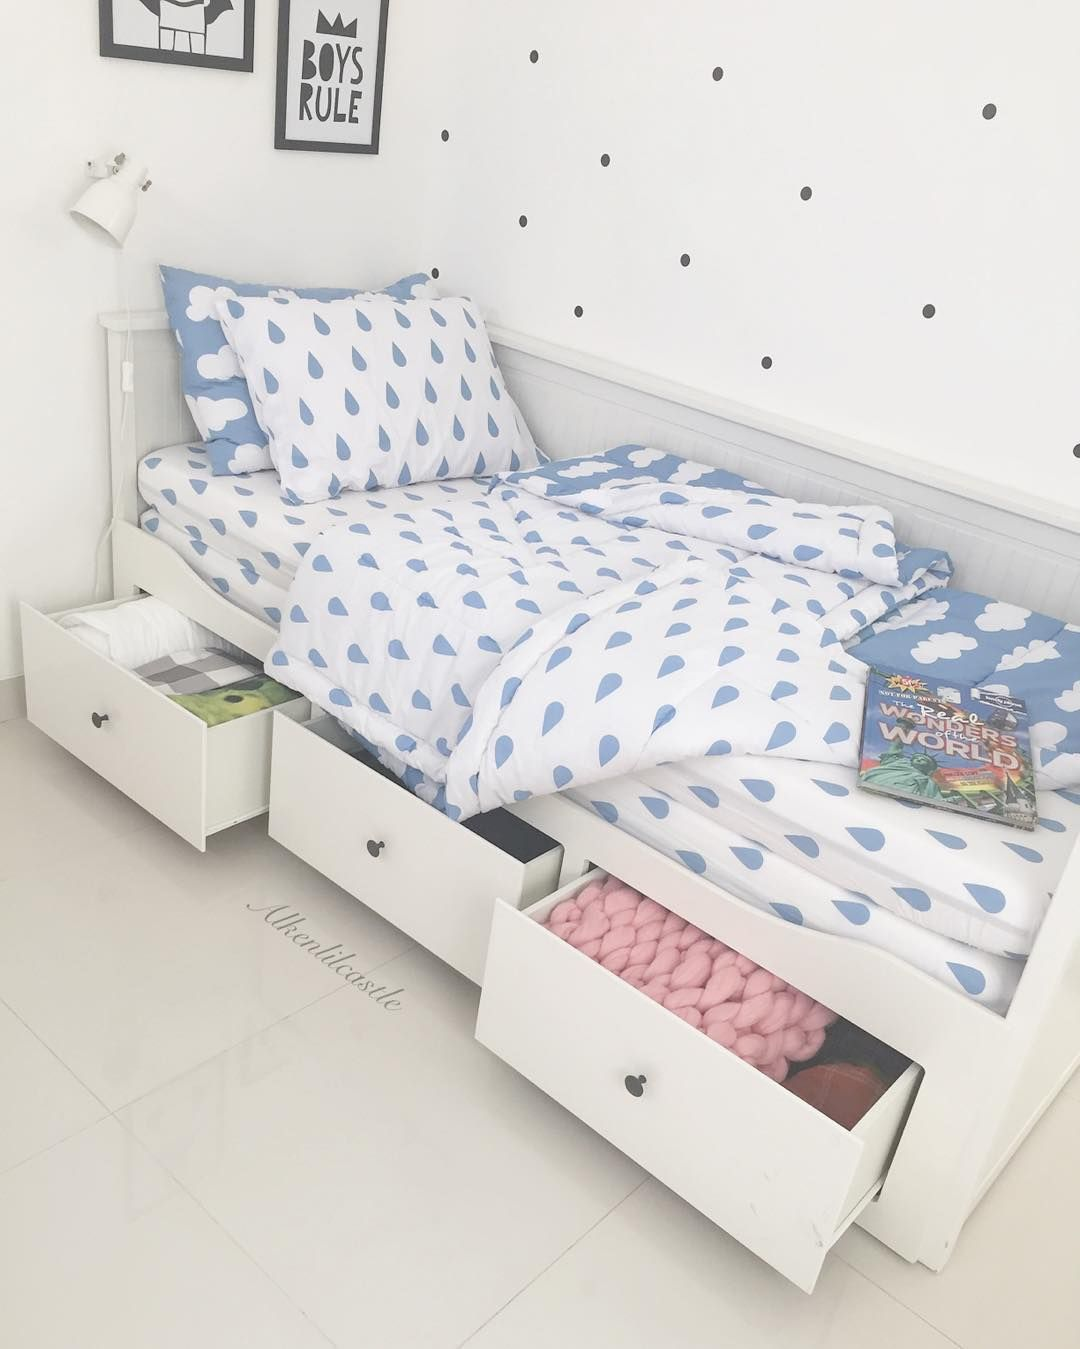 desain kamar tidur anak laki laki sederhana namun modern | dekorasi